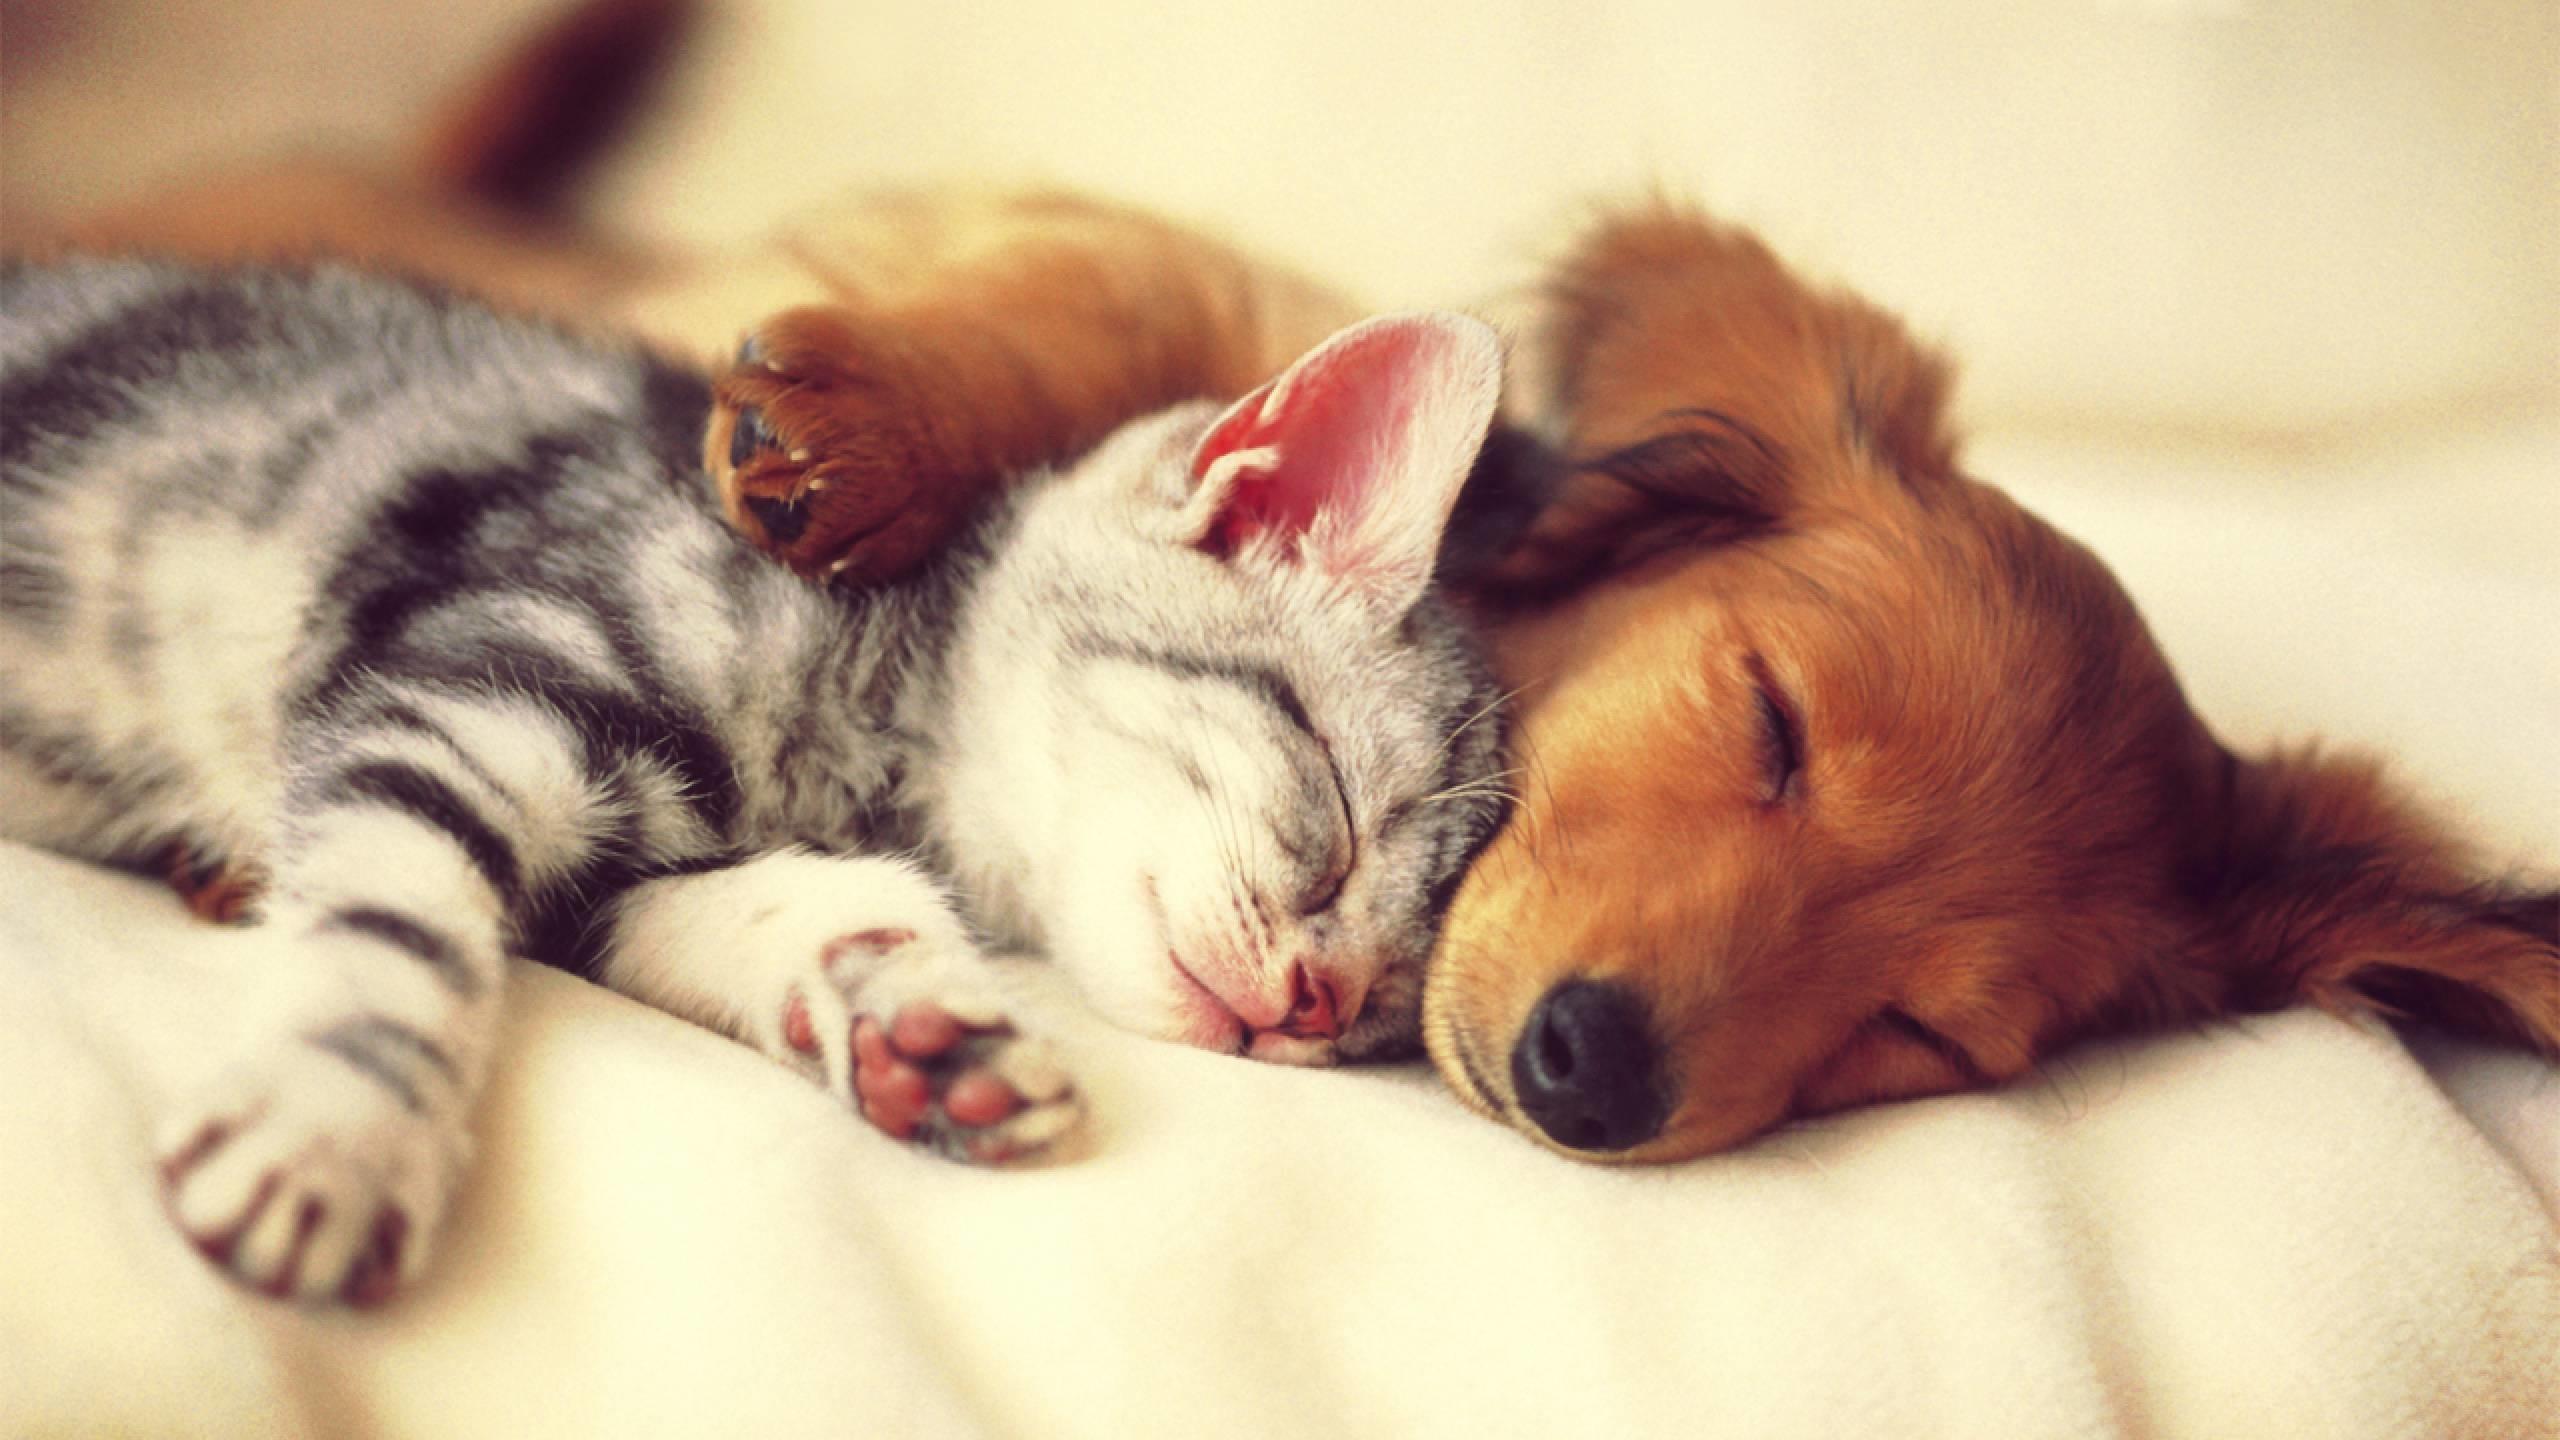 … cute cat and dog sleep wallpaper.